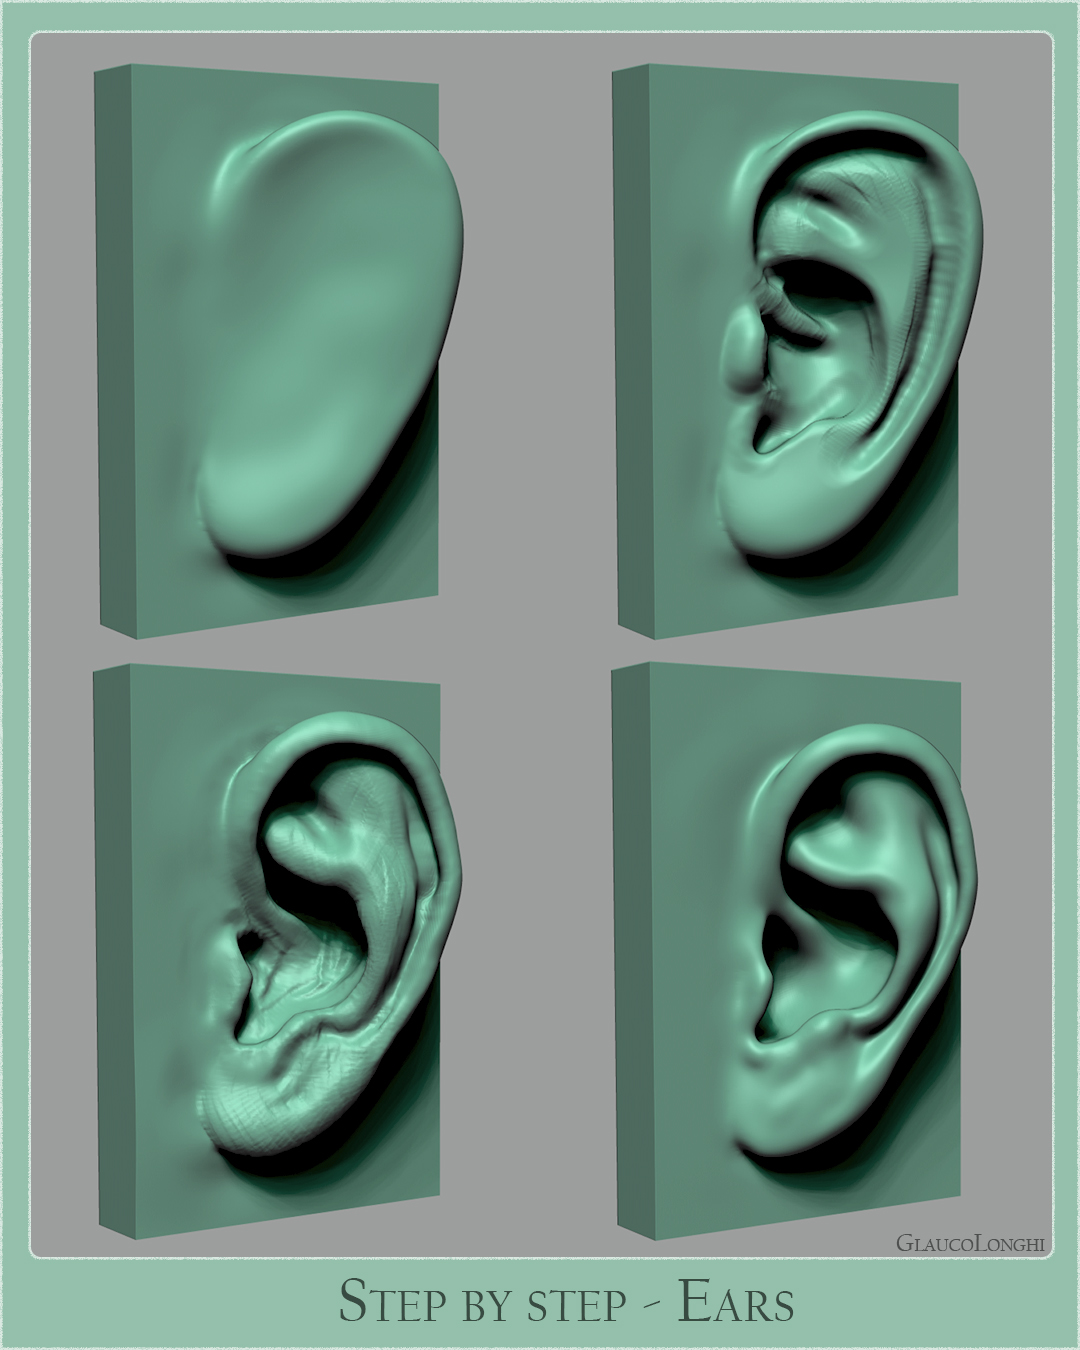 sbs_ears_006.jpg